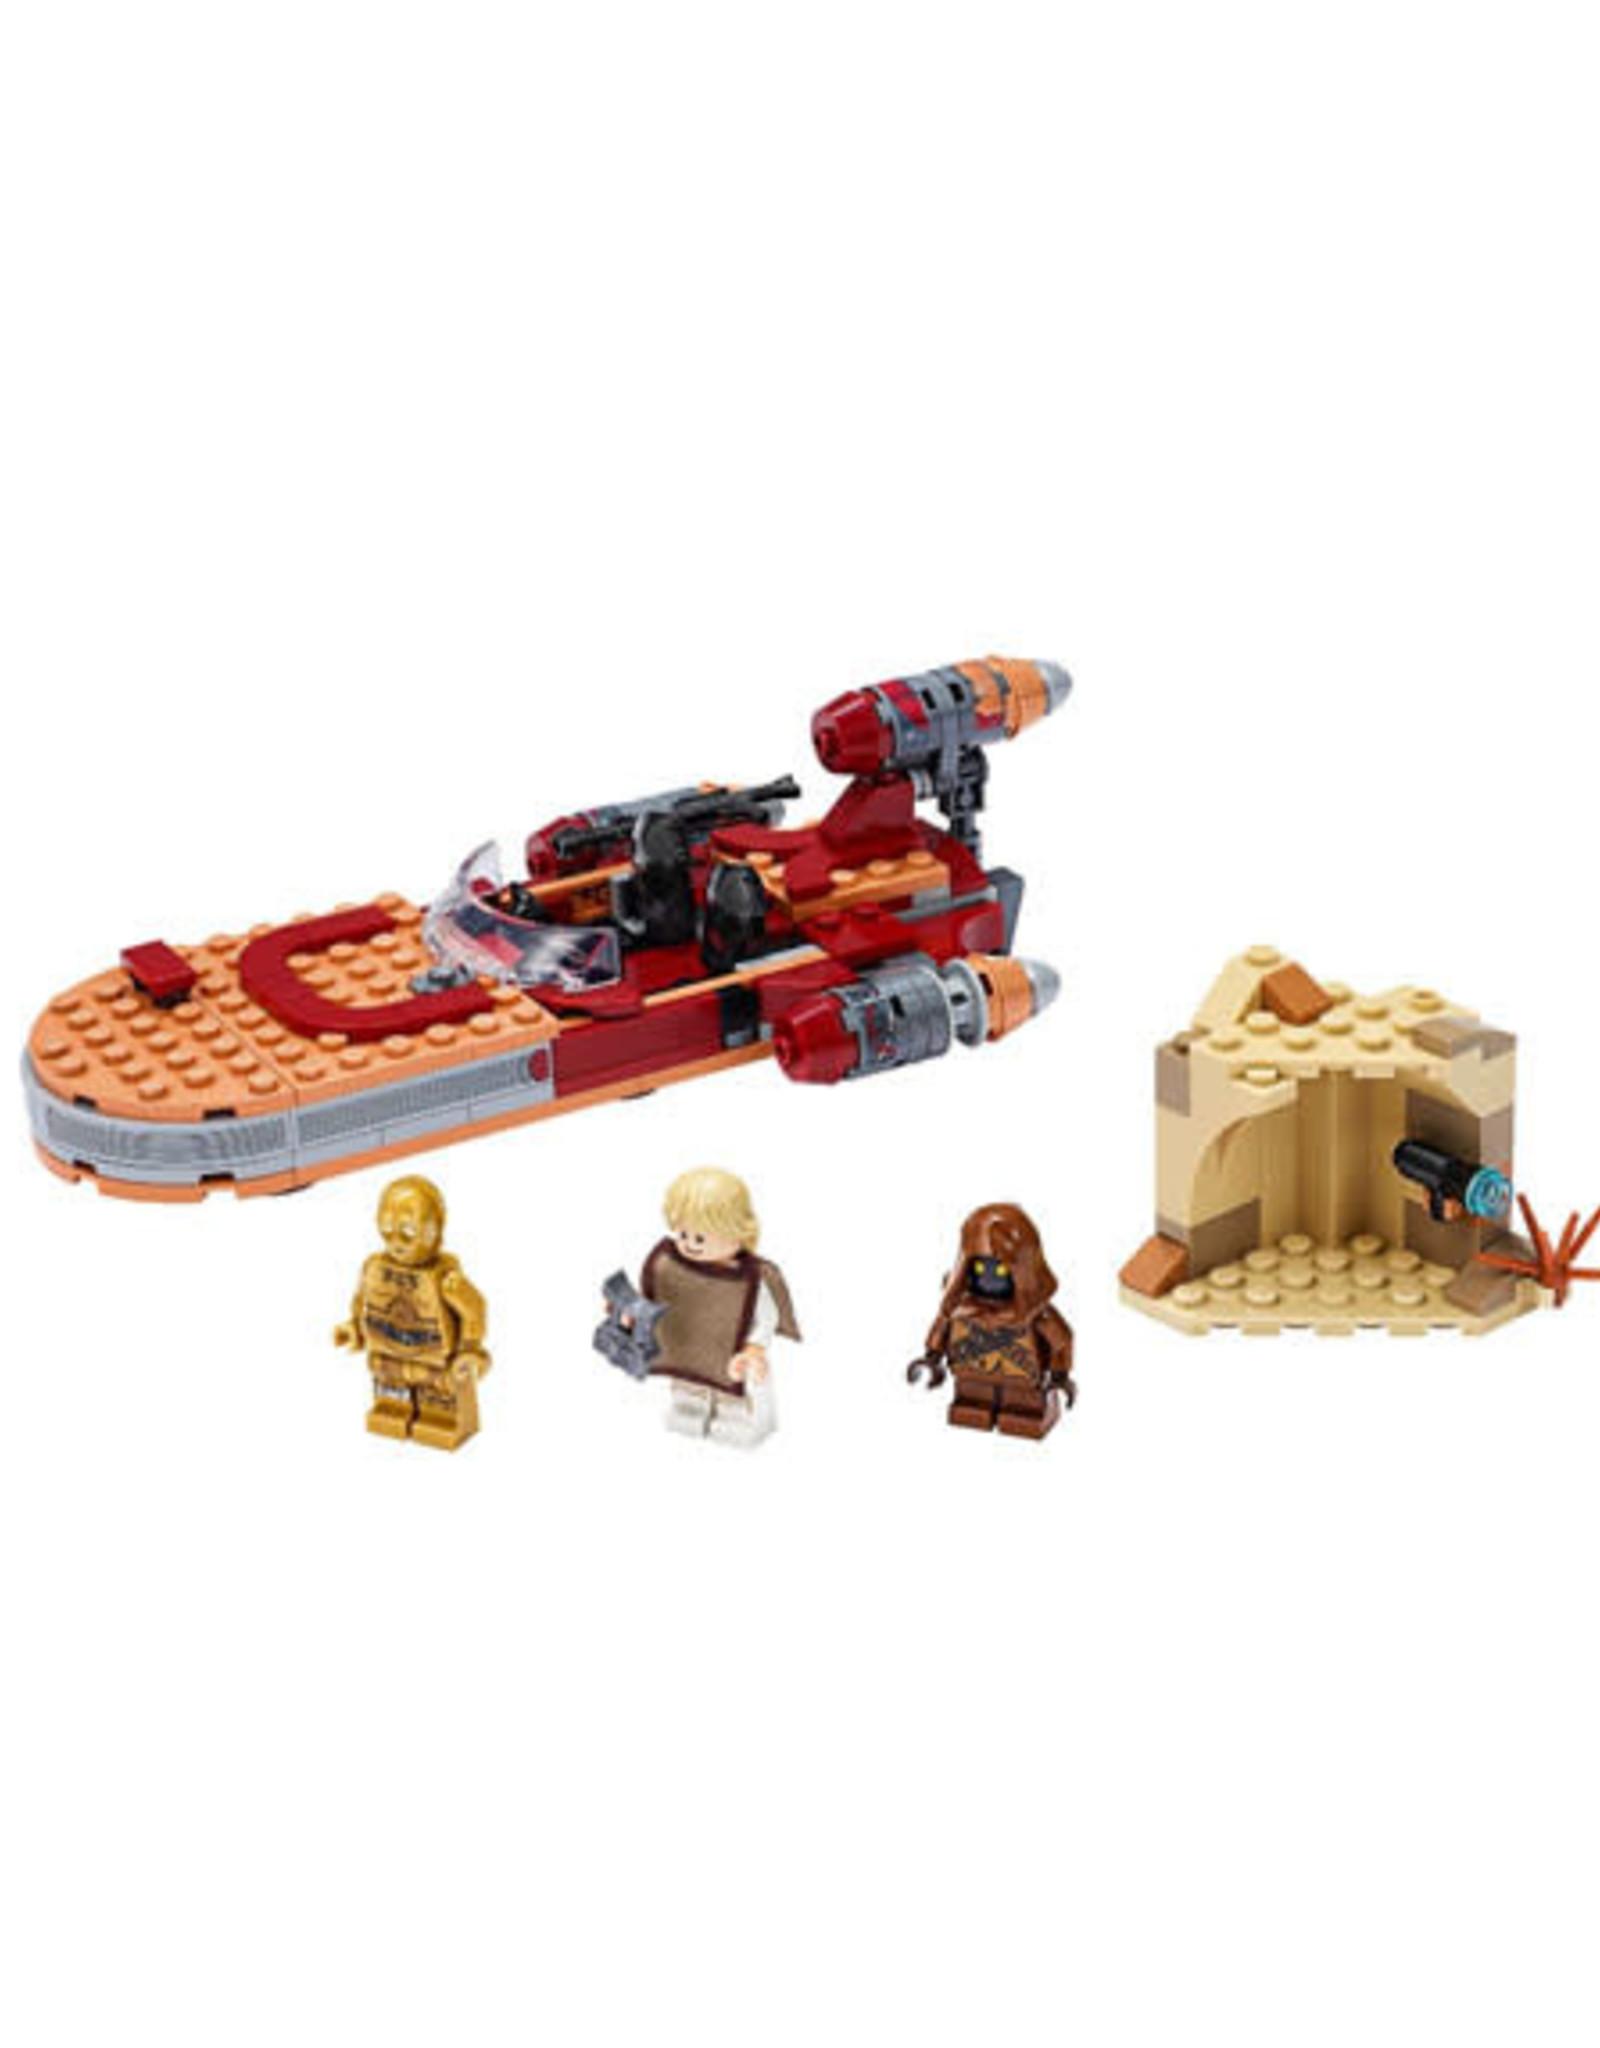 LEGO LEGO 75271 Luke Skywalker's Landspeeder STAR WARS NIEUW